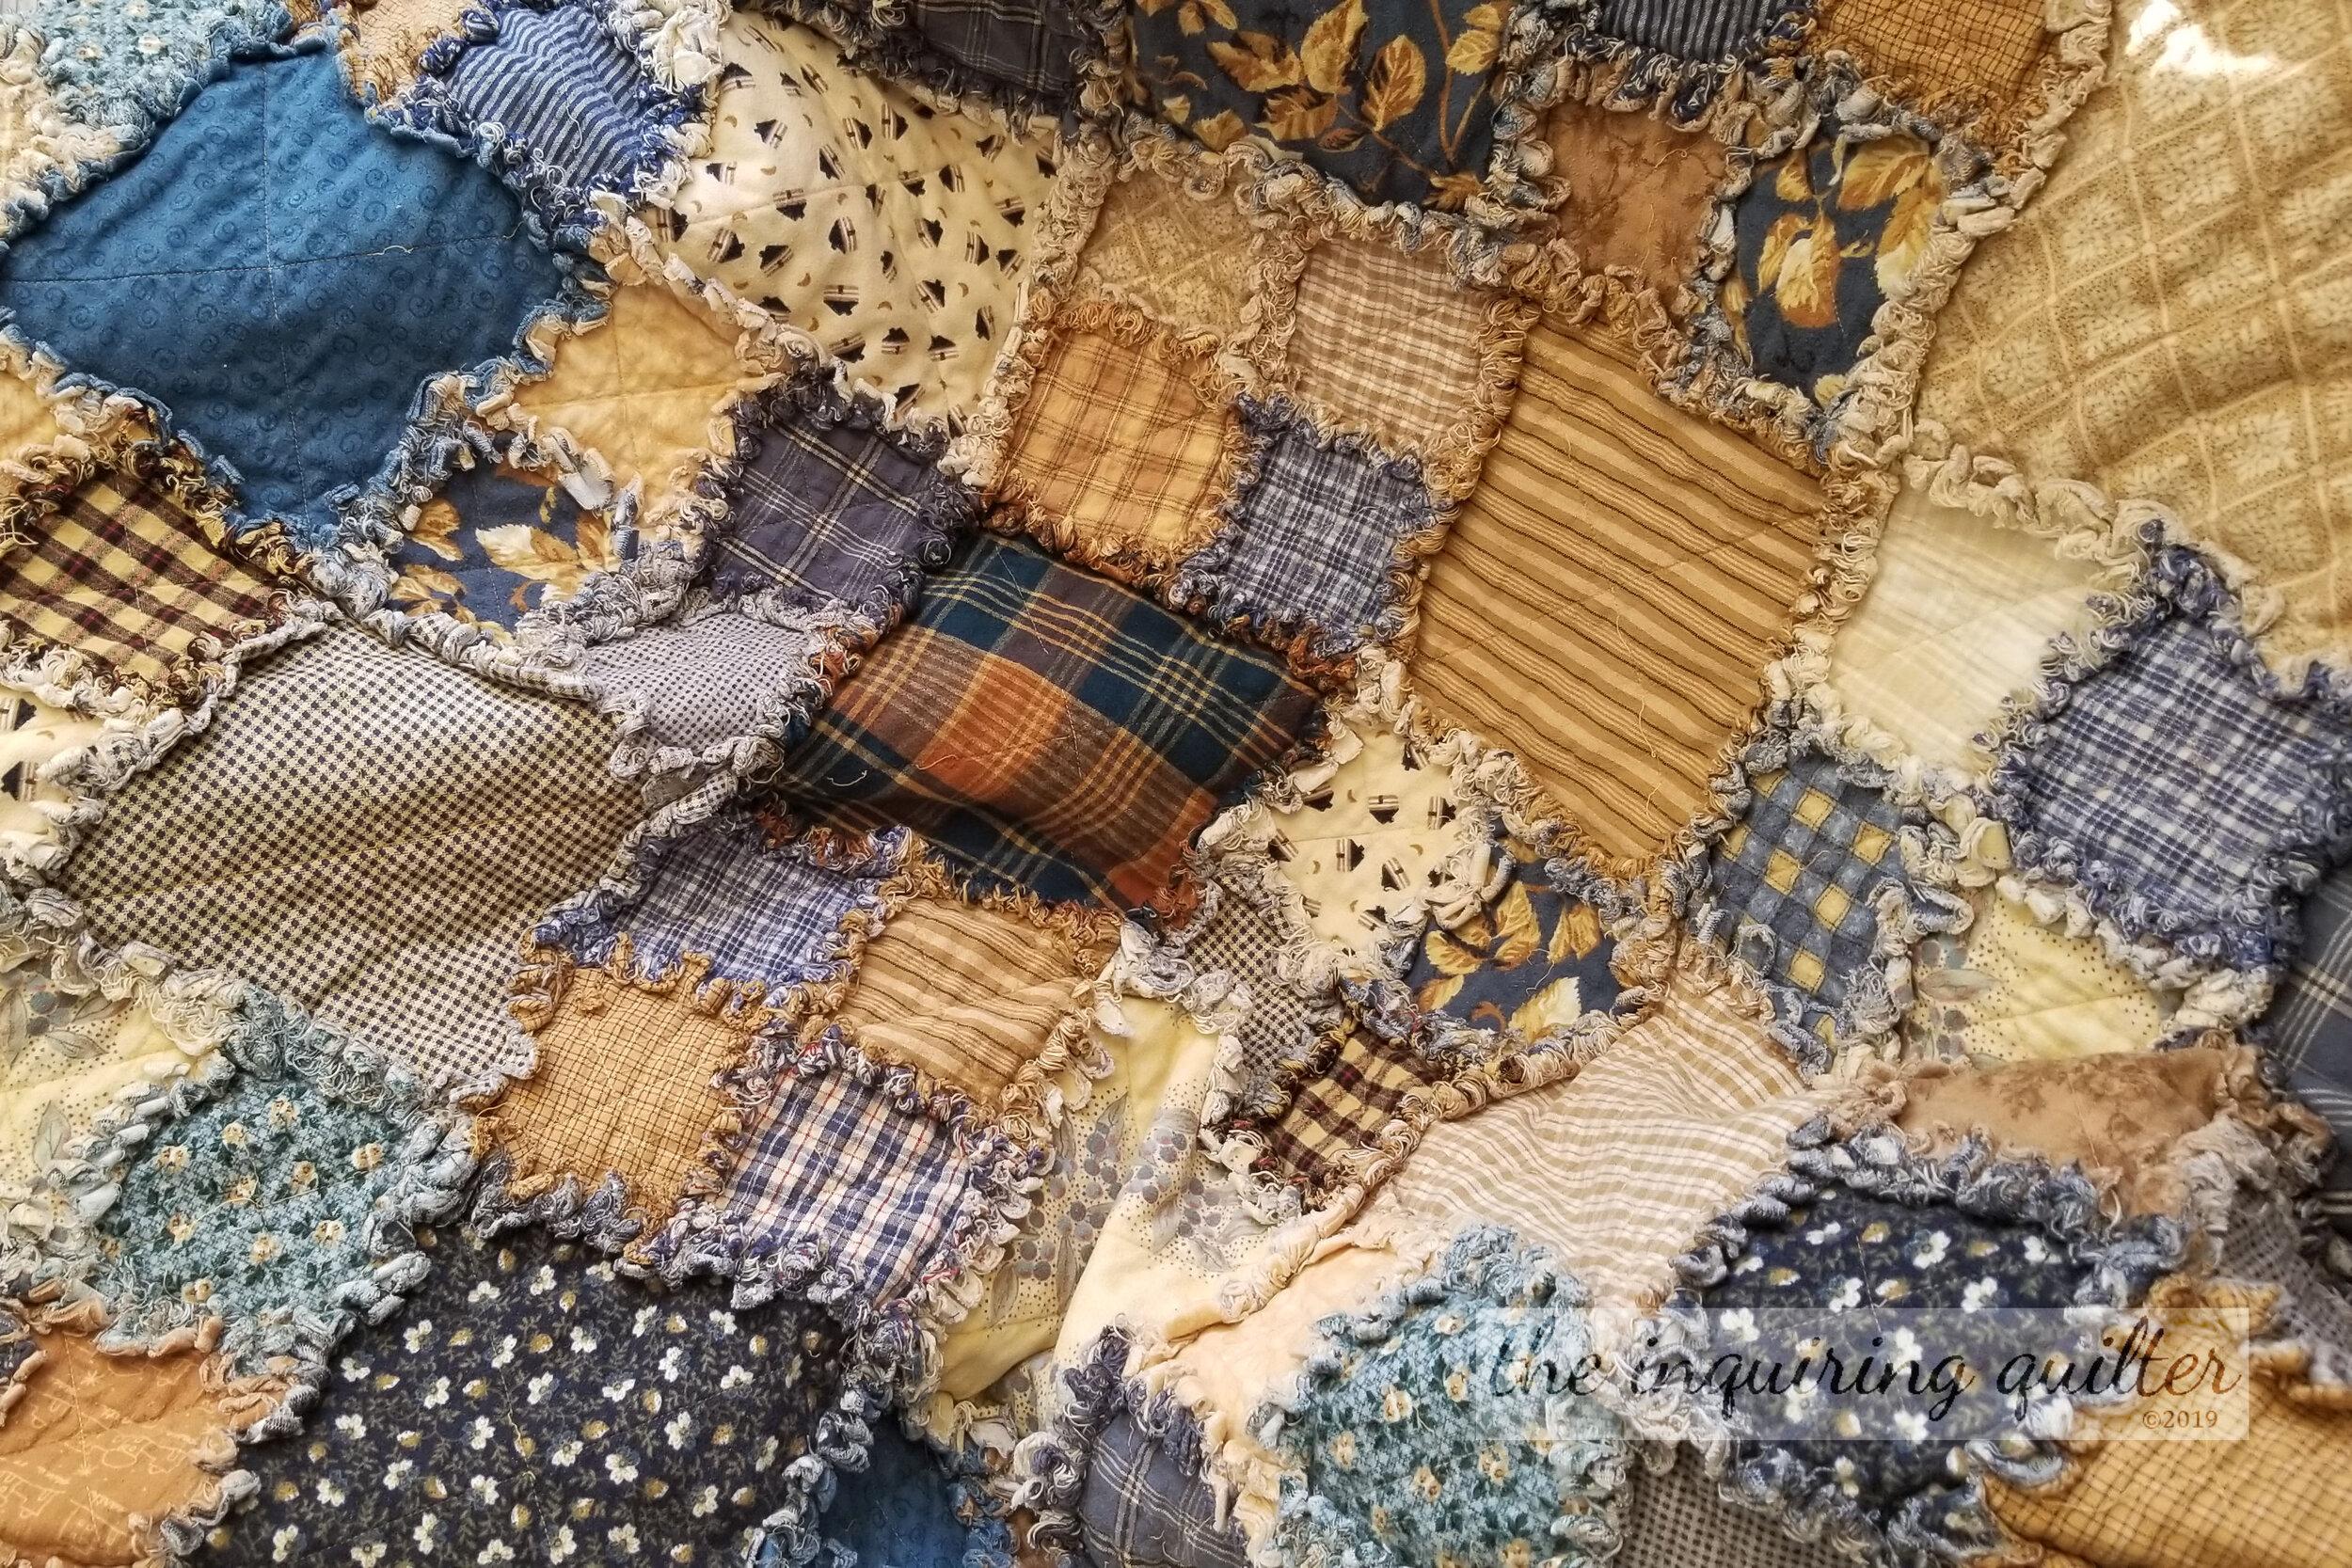 Moms Flannel Quilt 2.jpg